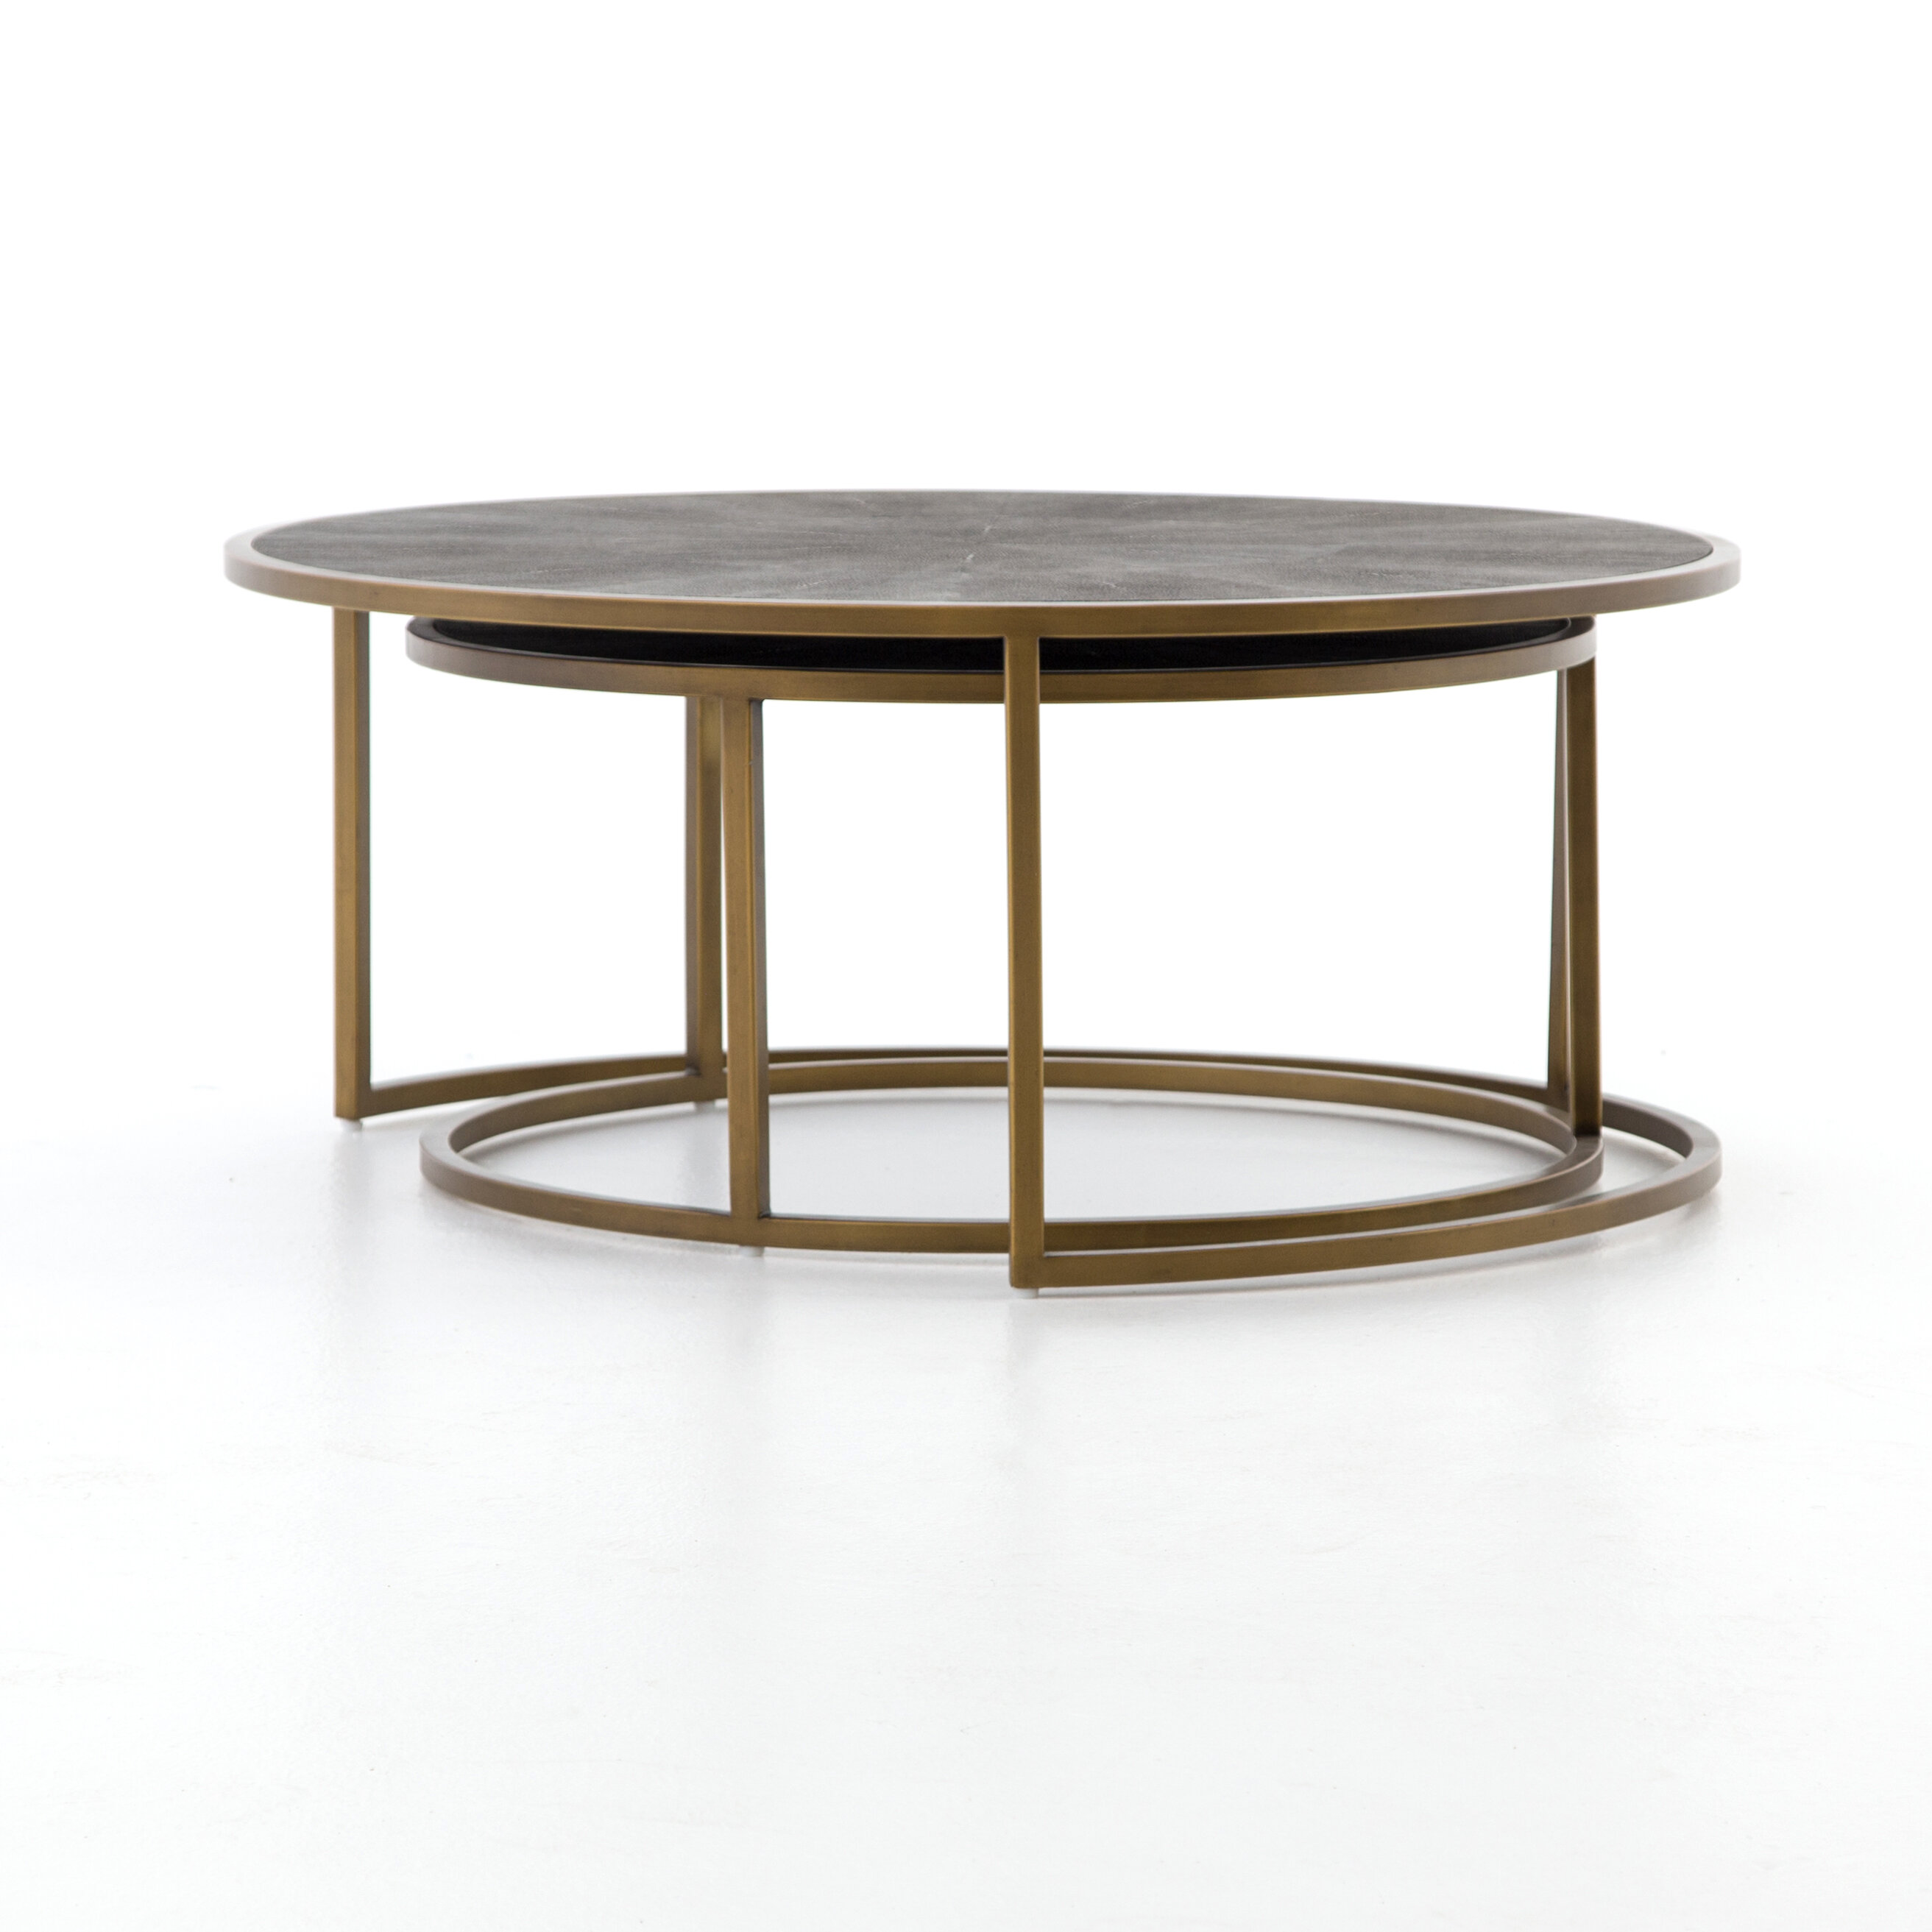 Demarcus 2 Piece Coffee Table Set